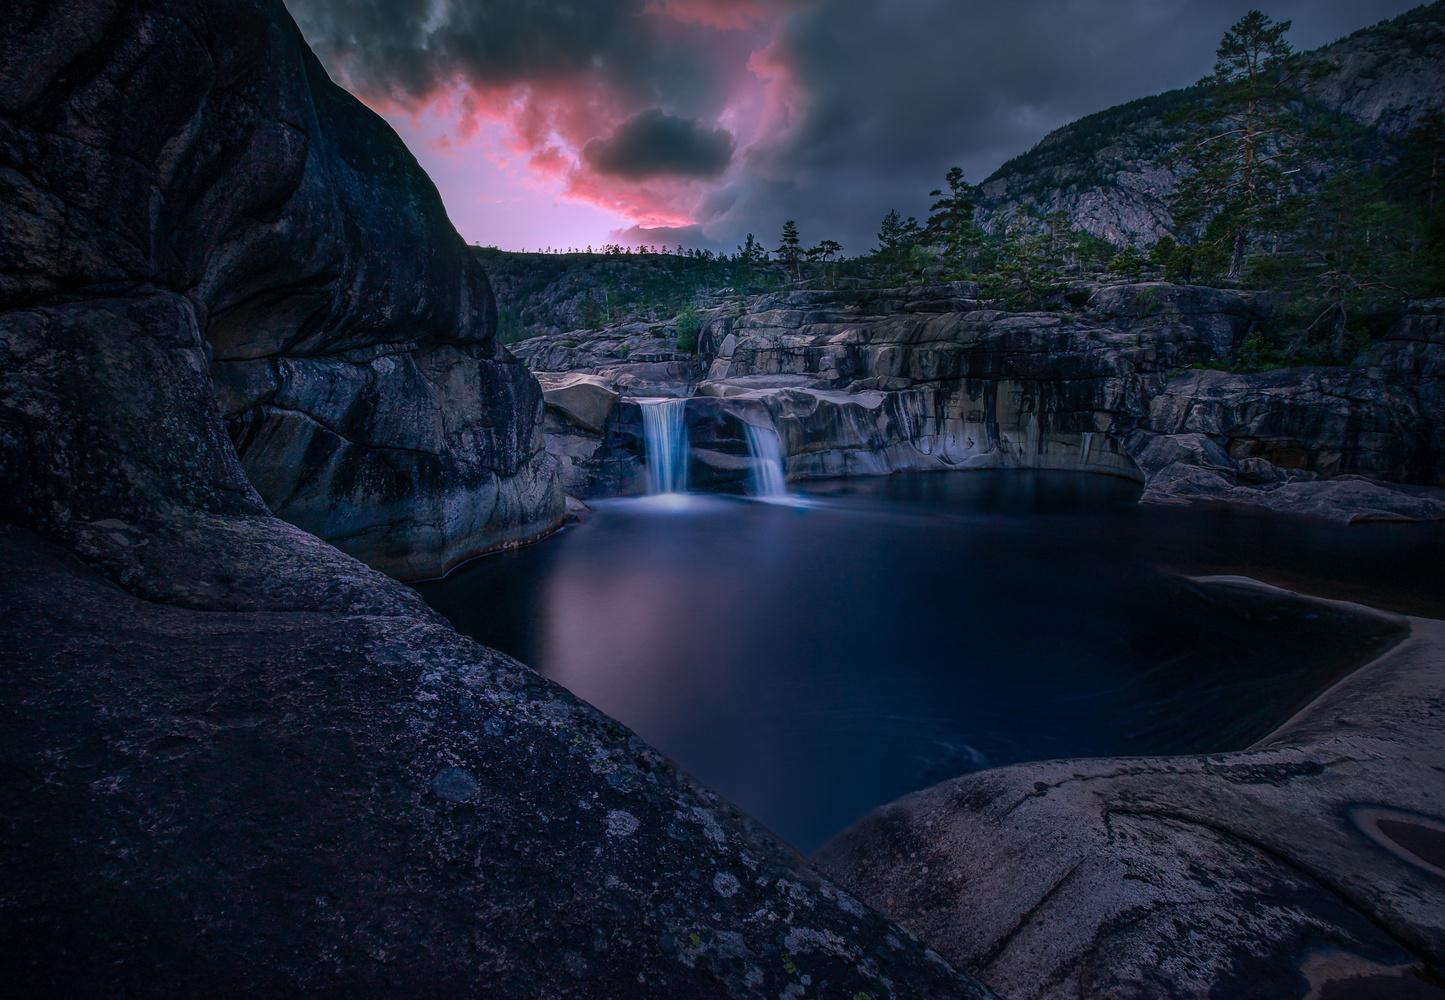 Sunset in Telemark, Norway by Roger Kristiansen